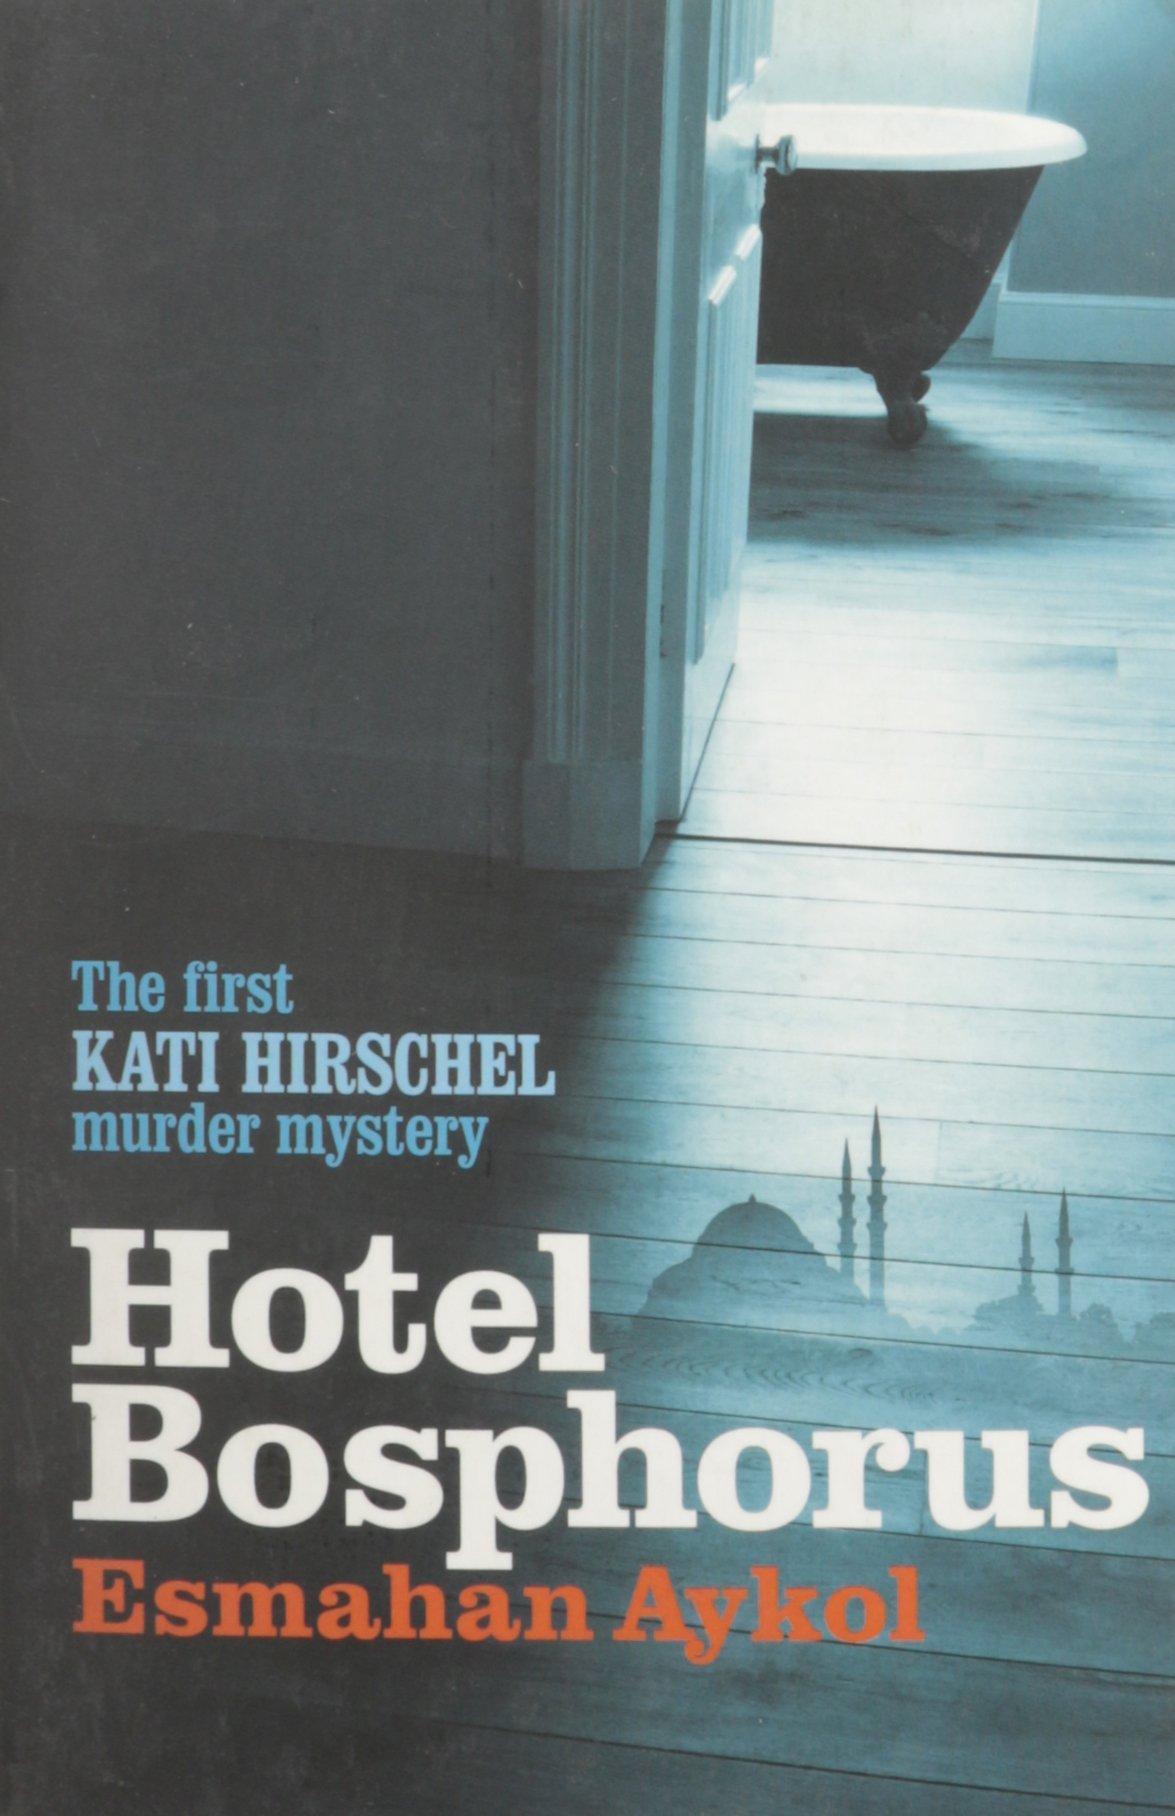 Hotel Bosphorus (Kati Hirschel Murder Mystery) pdf epub